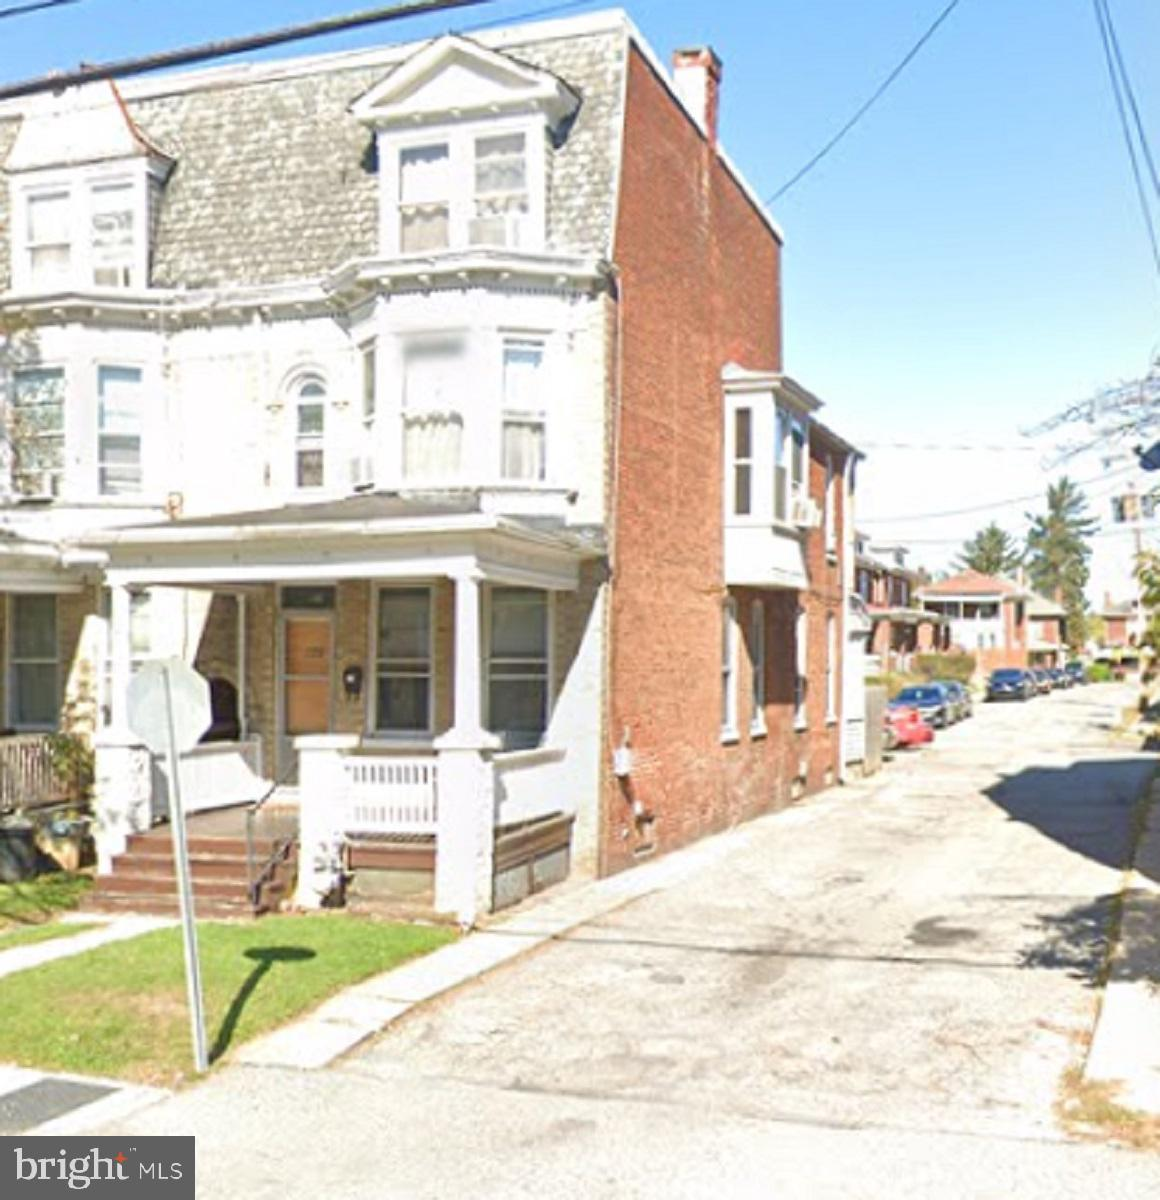 129 W Jackson Street, York, PA 17401